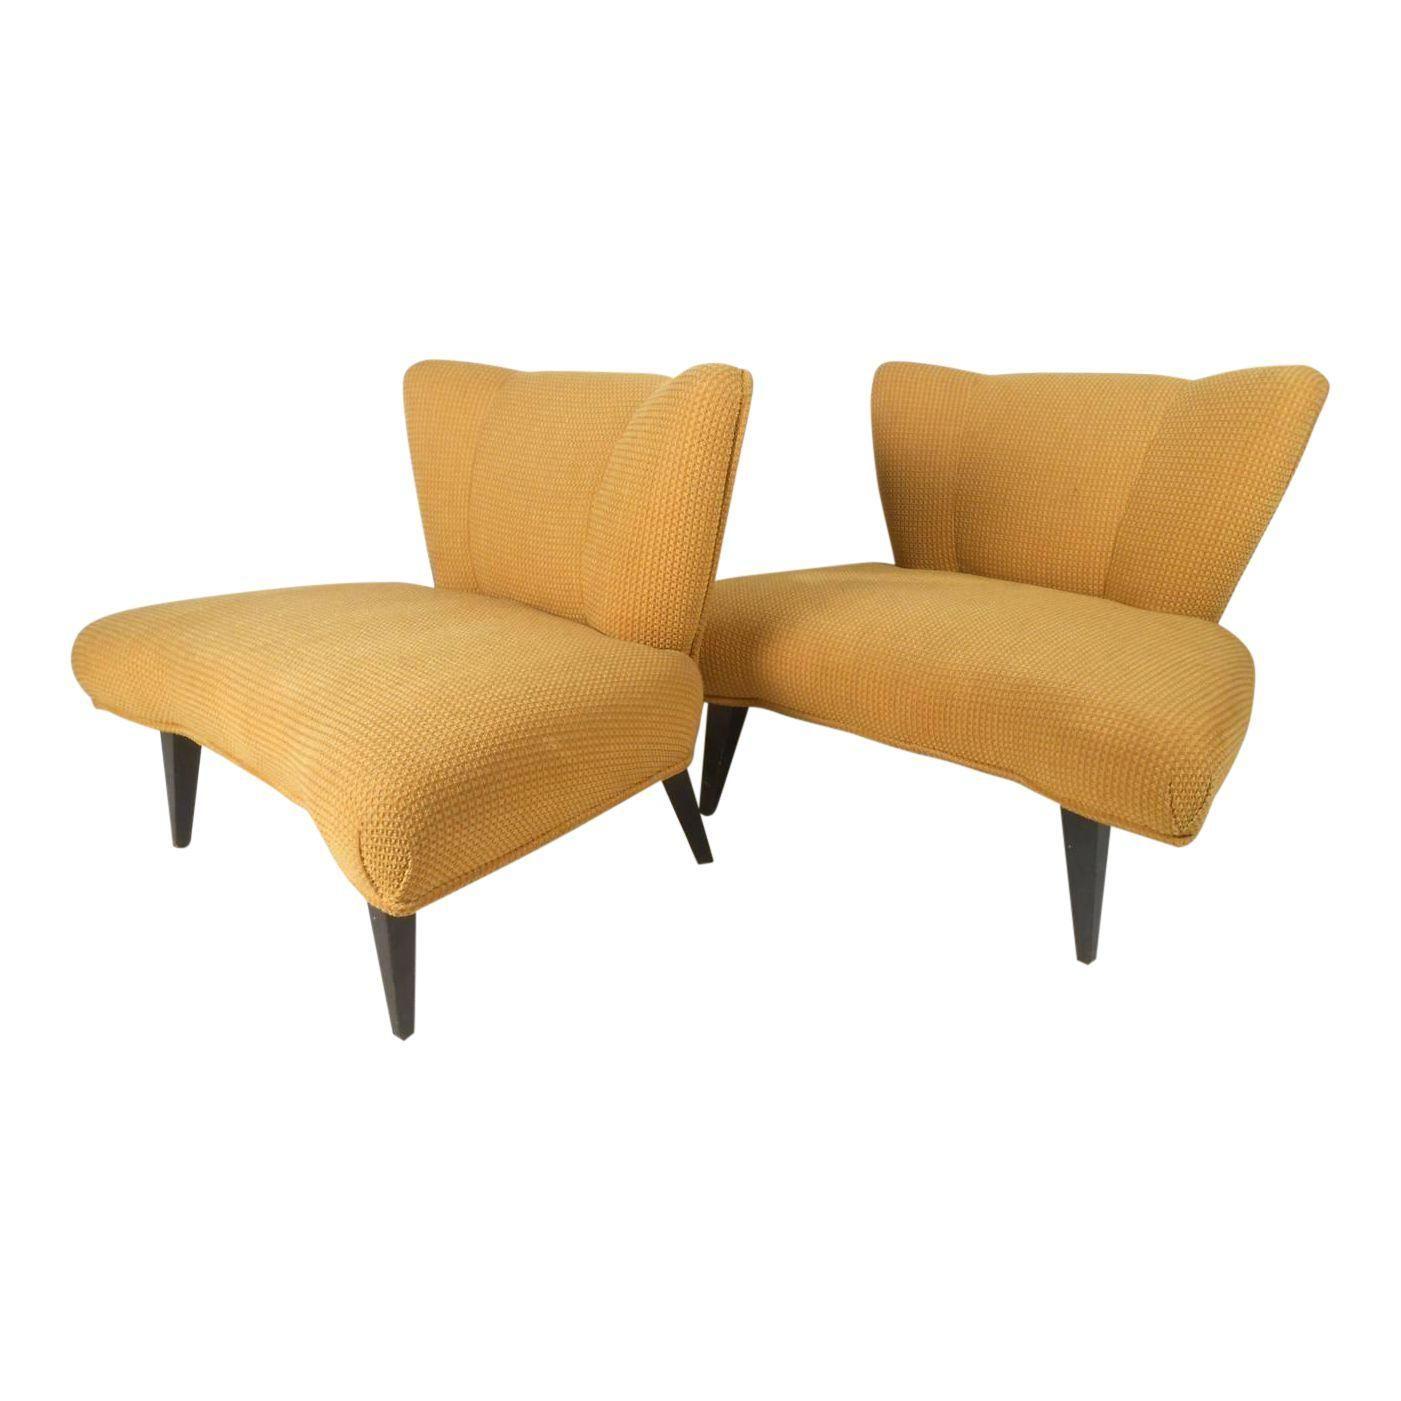 Kroehler Accent Chair Elan Key Pattern: Vintage Modern Slipper Chairs Attributed To Kroehler